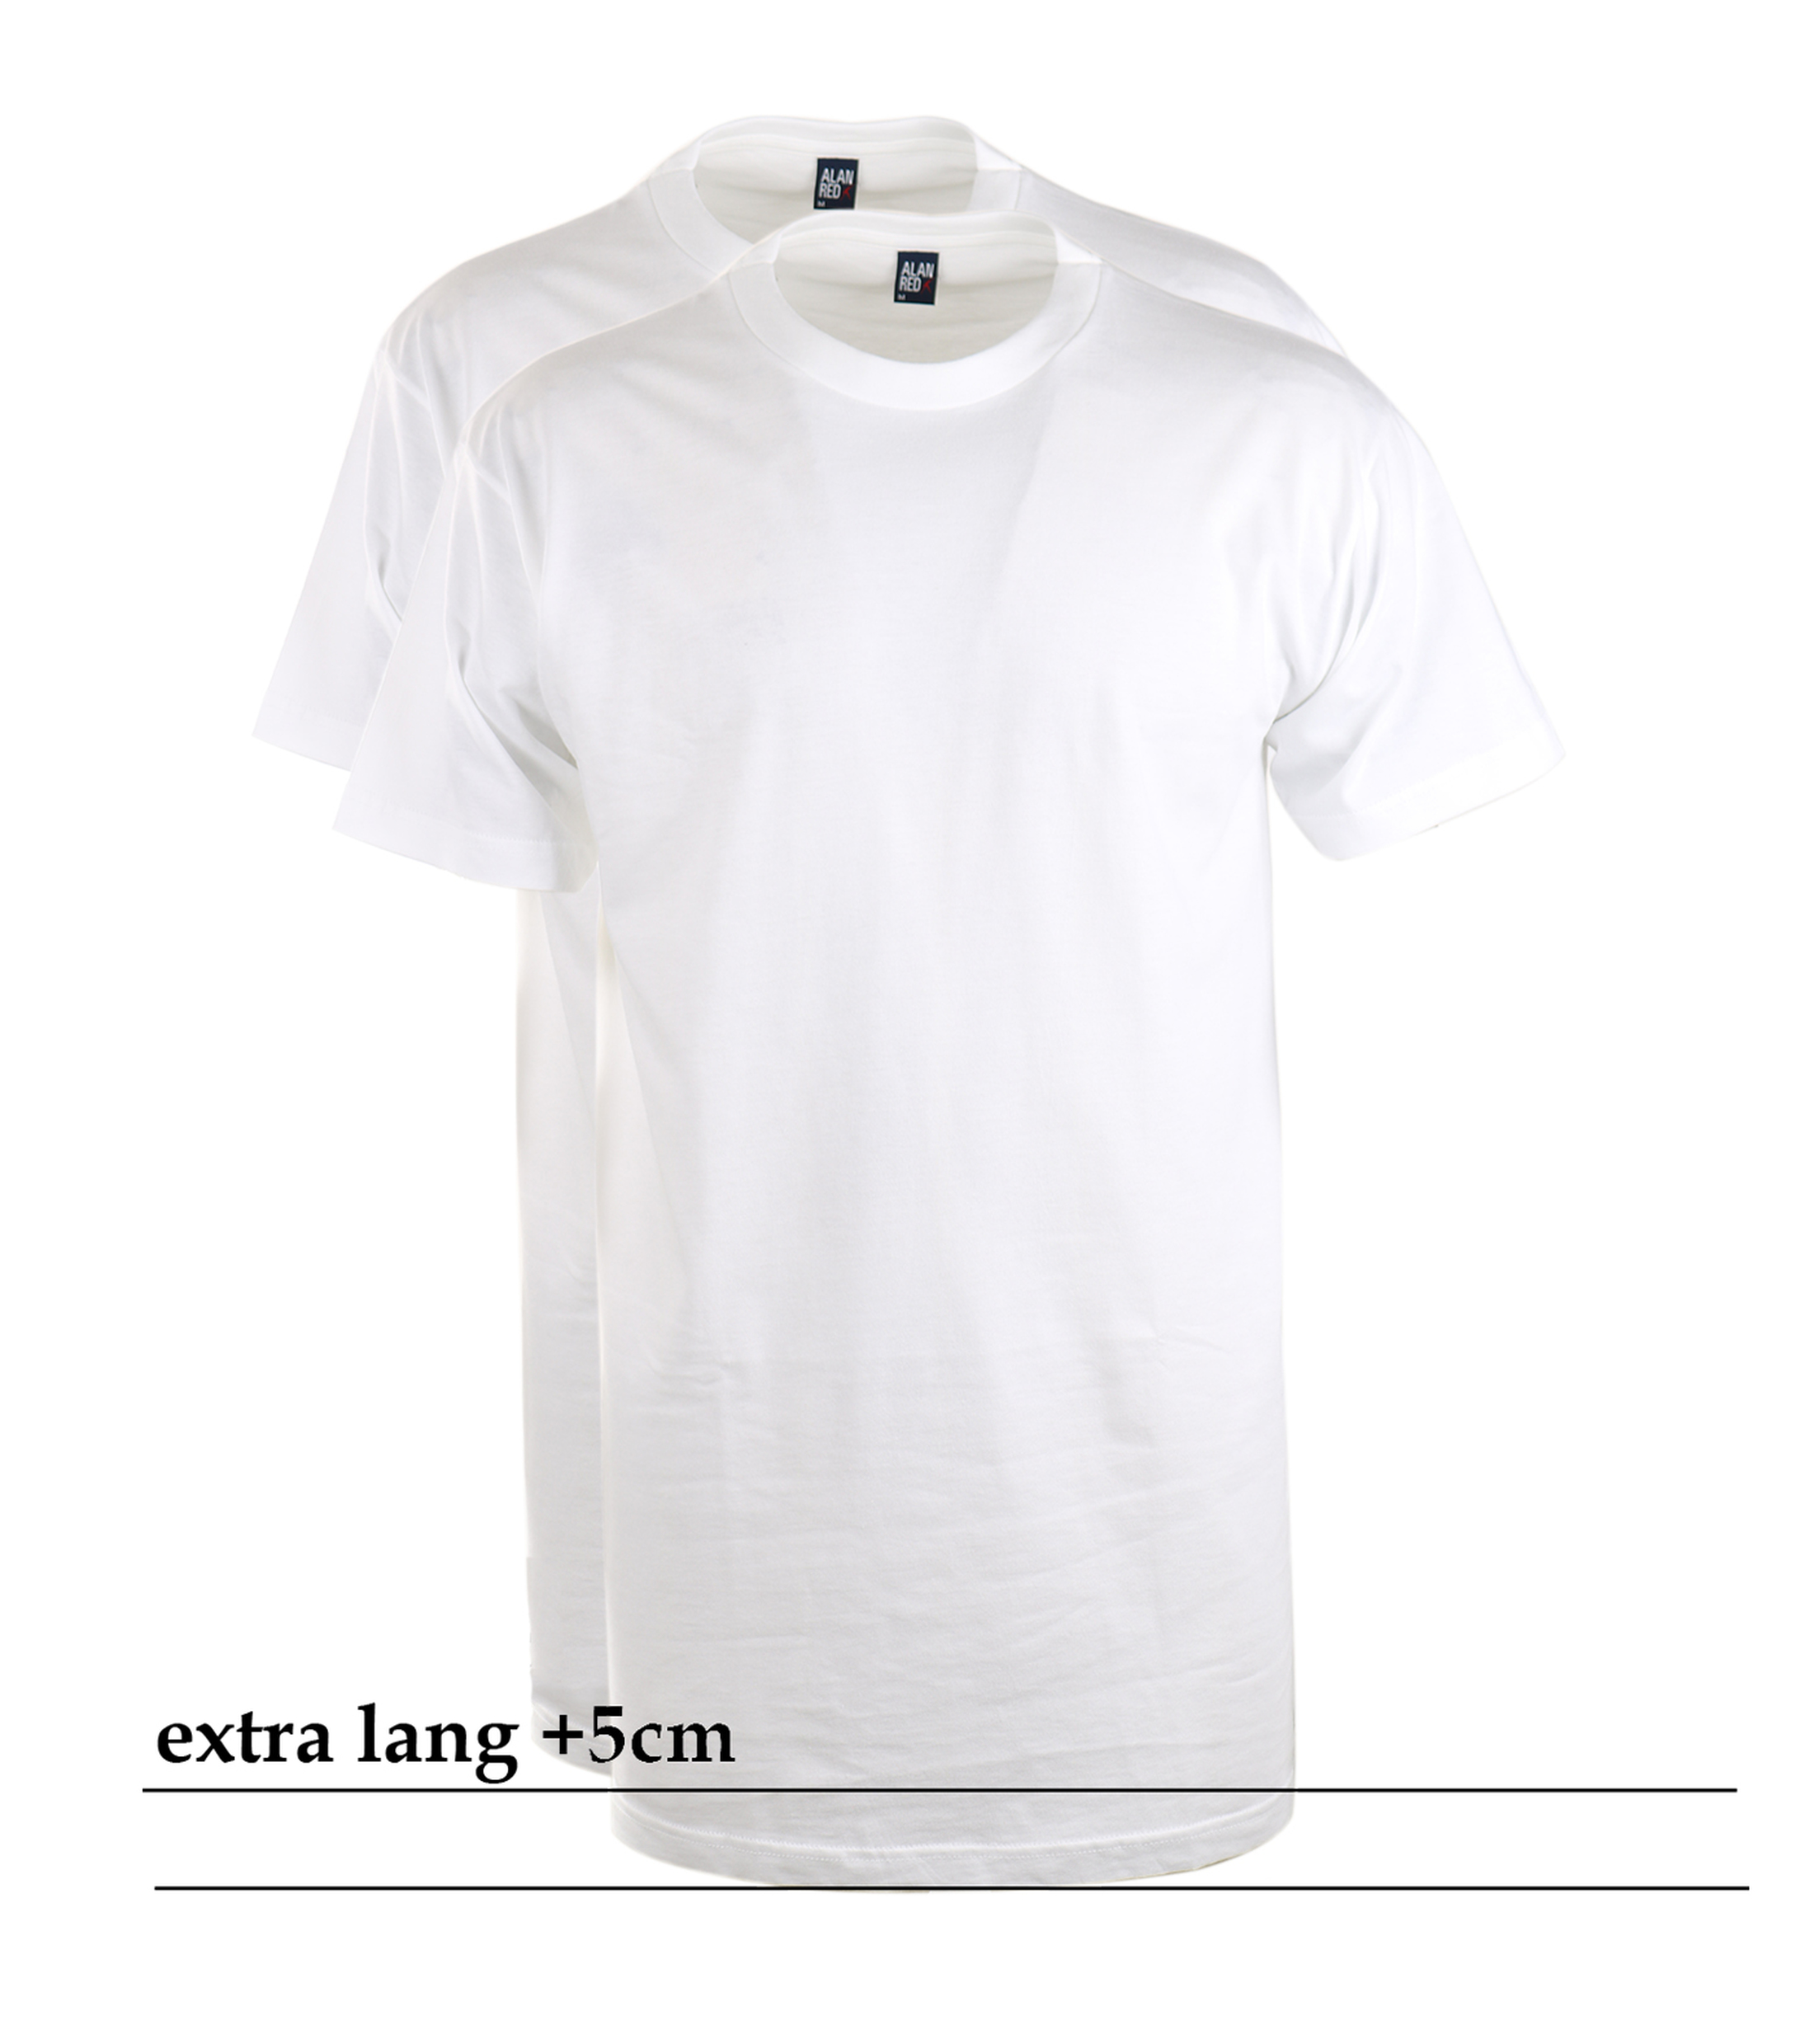 Alan Red T-Shirt Virginia Extra Long (2pack) foto 0